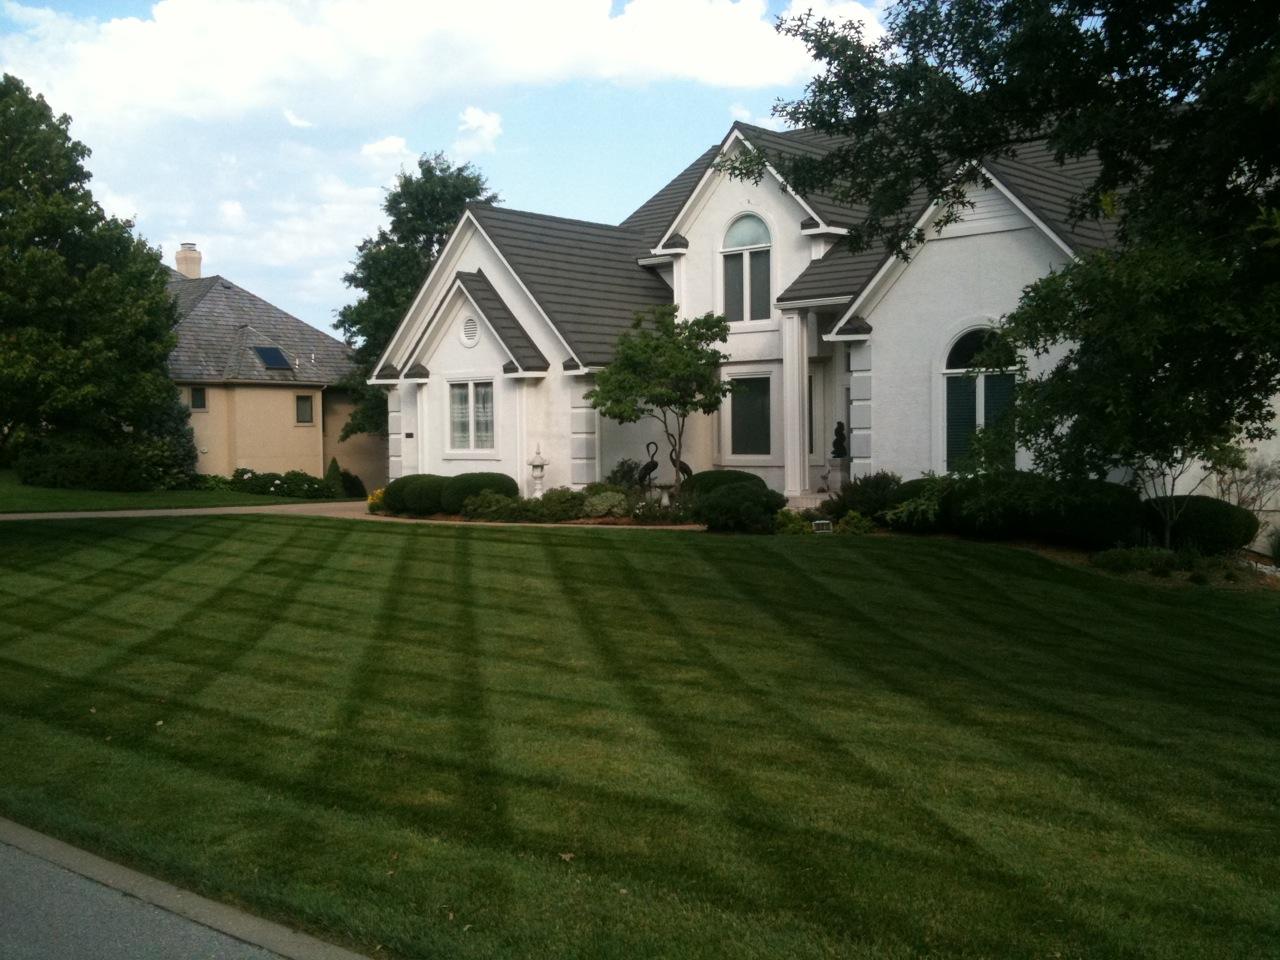 Kc Garden Gate Lawn Care Amp Landscaping Belton 816 744 8899